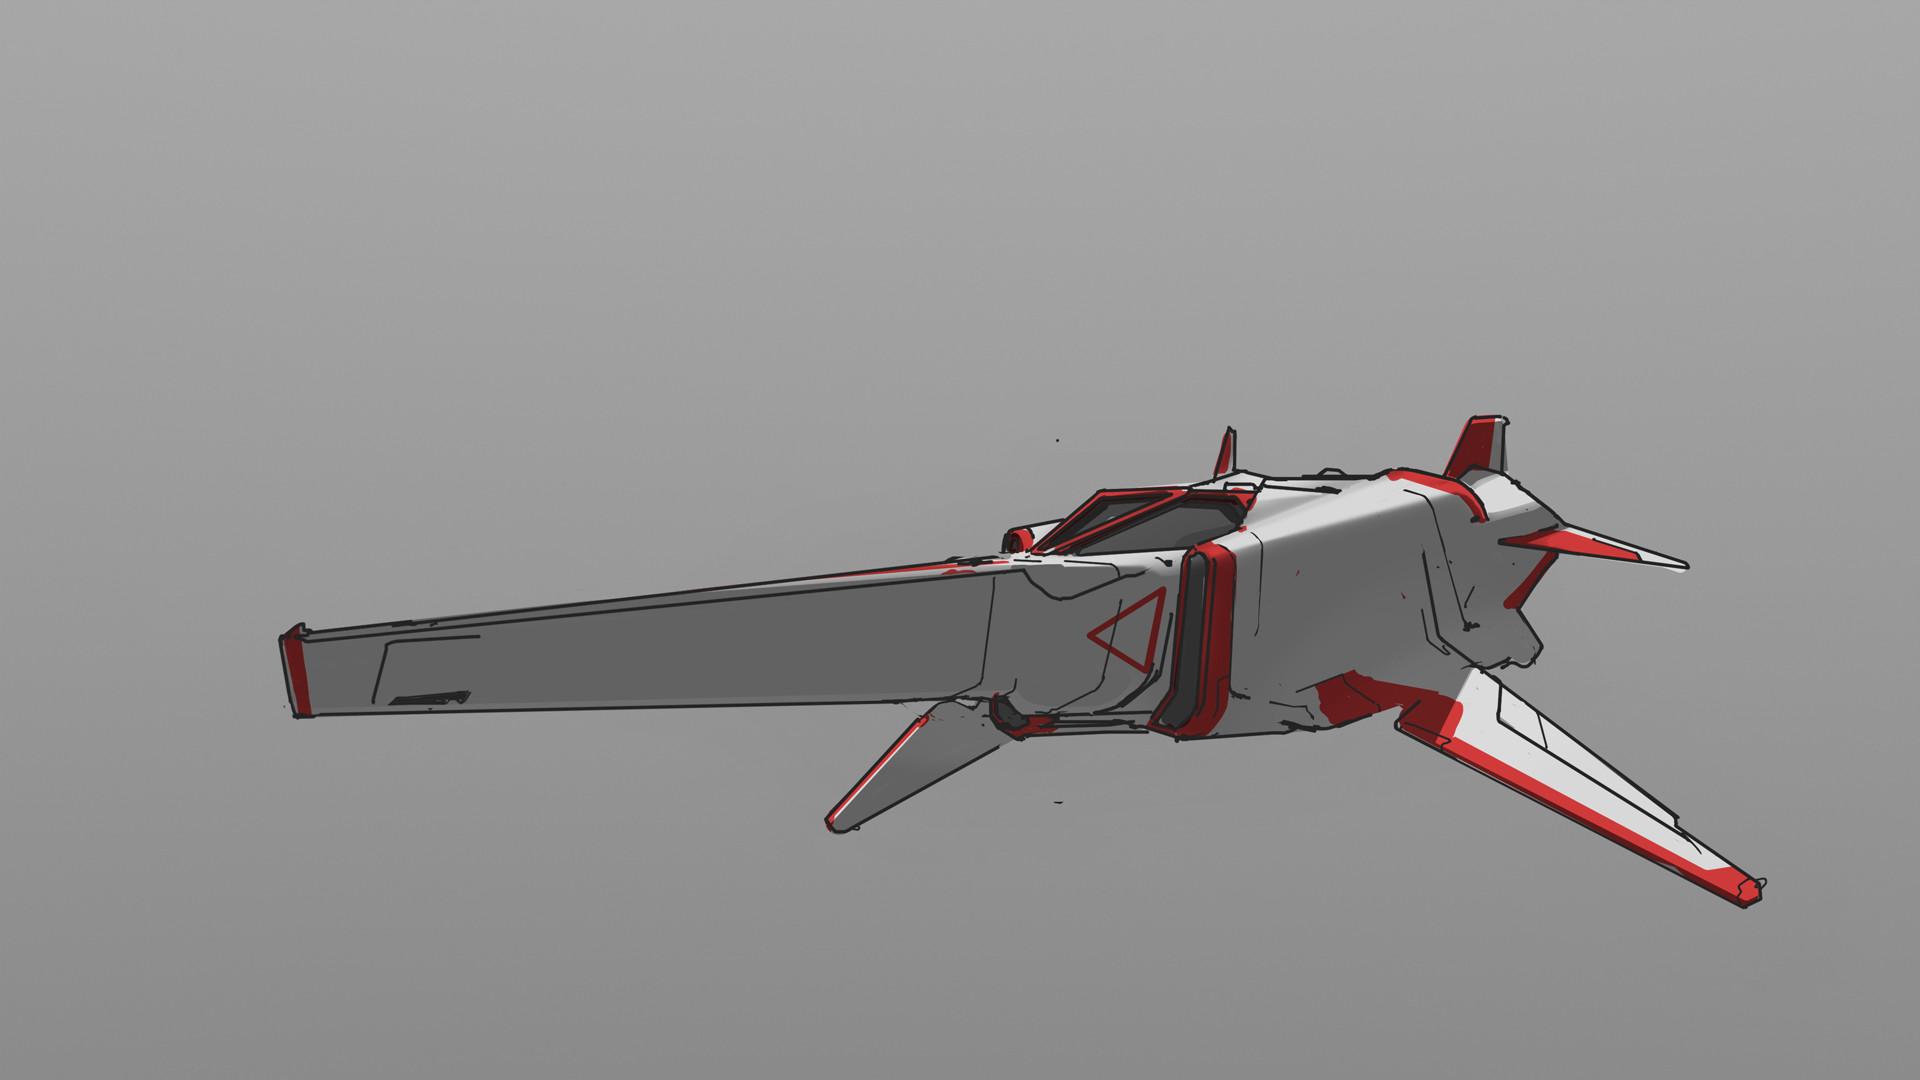 German casado fraga asl spaceship 012 v004 b